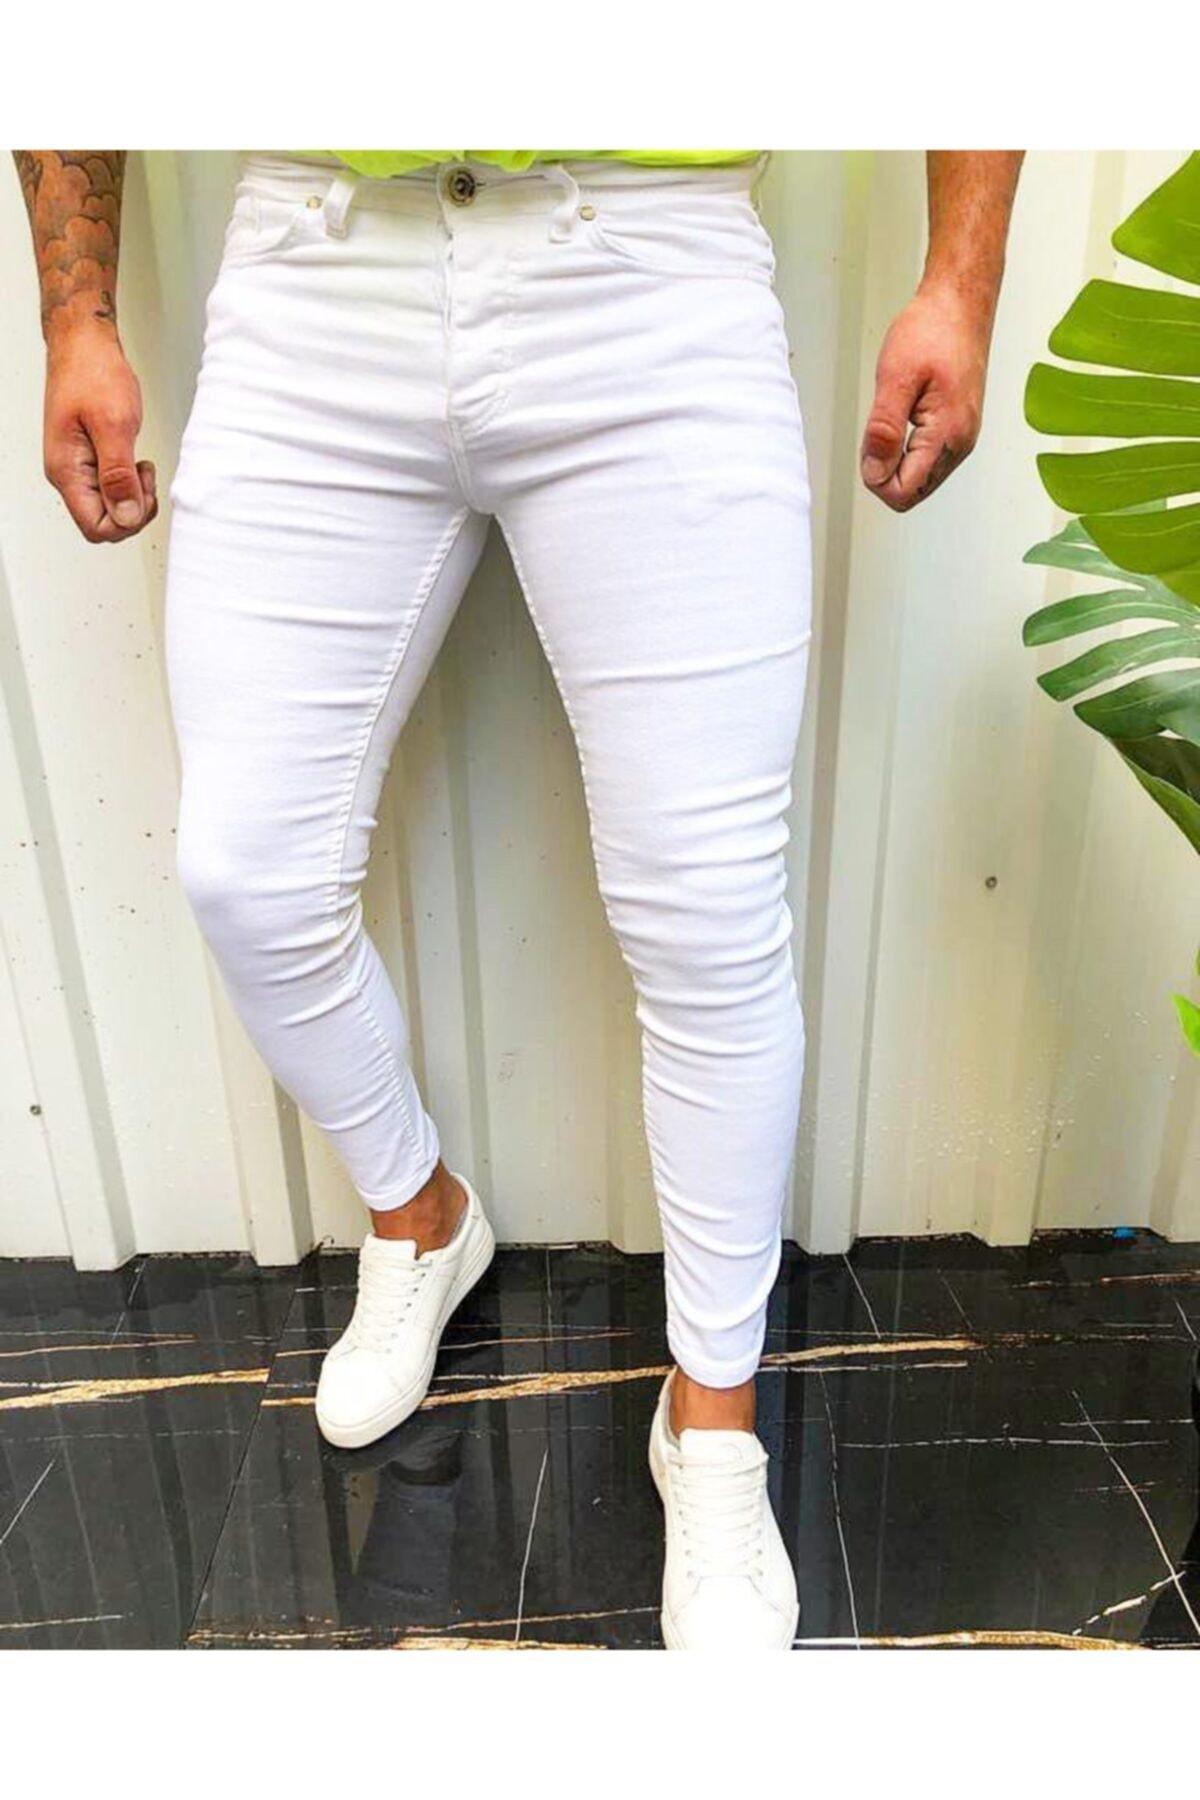 ukdwear Erkek Beyaz Italyan Kesim  Kot Pantolon 1